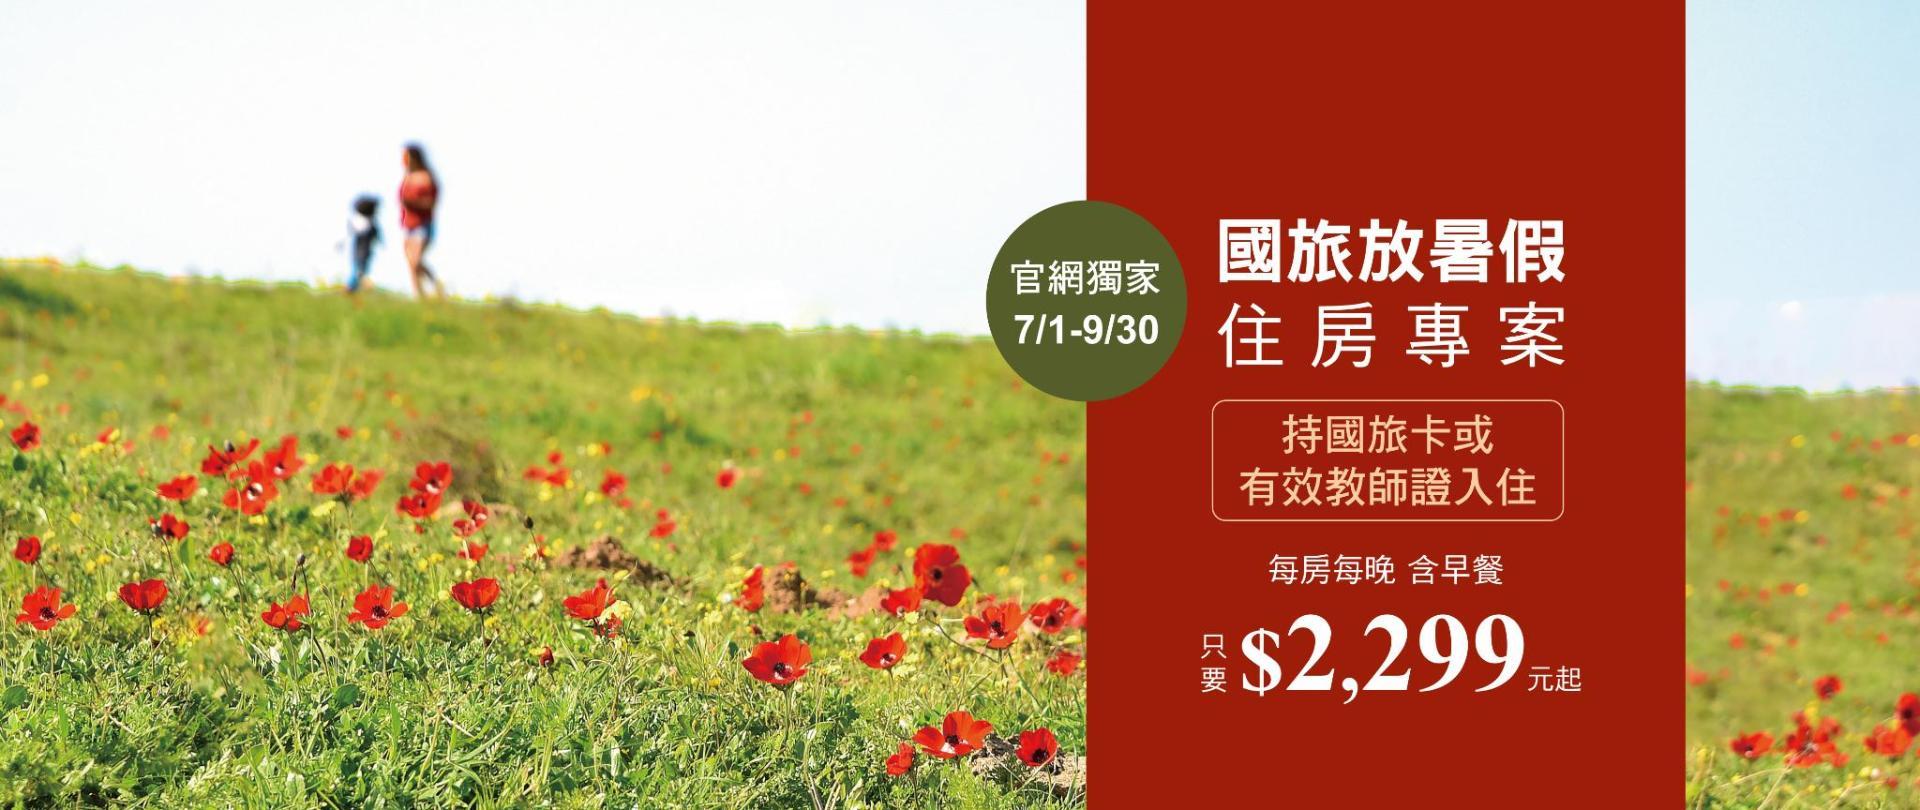 Slide Show1920X810_國旅放暑假.jpg